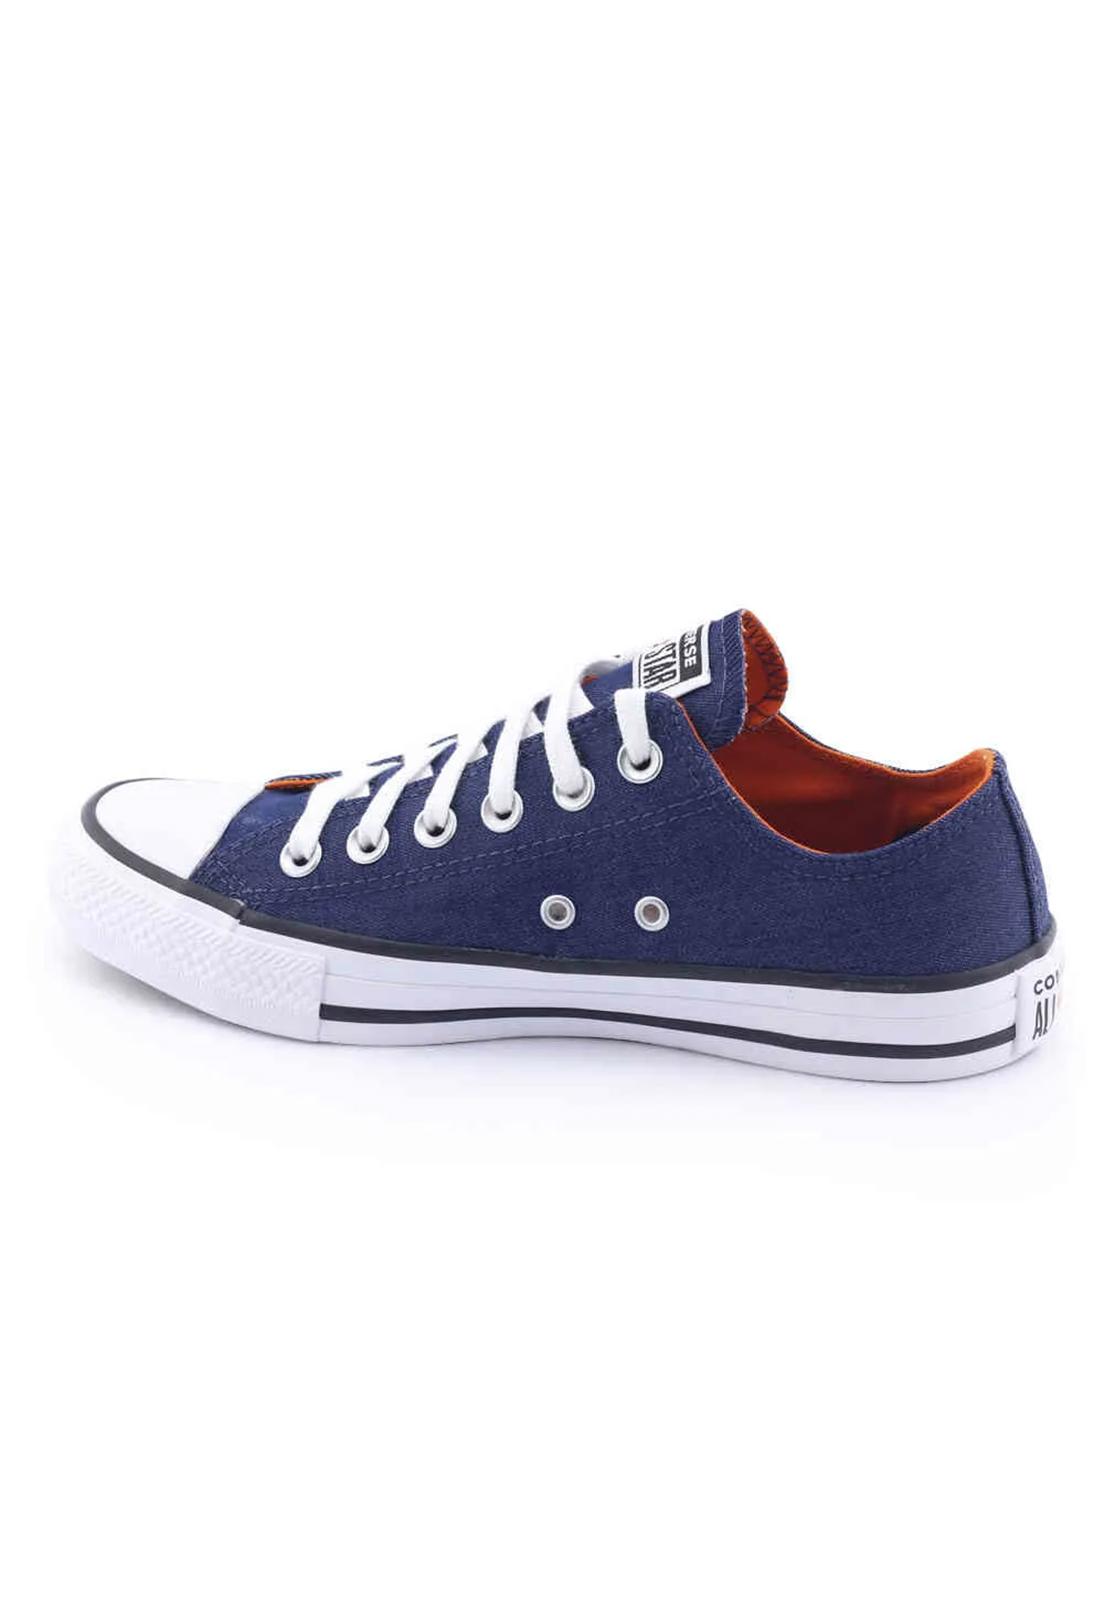 Tênis Converse Chuck Taylor All Star Ox Jeans Marinho Tangerina